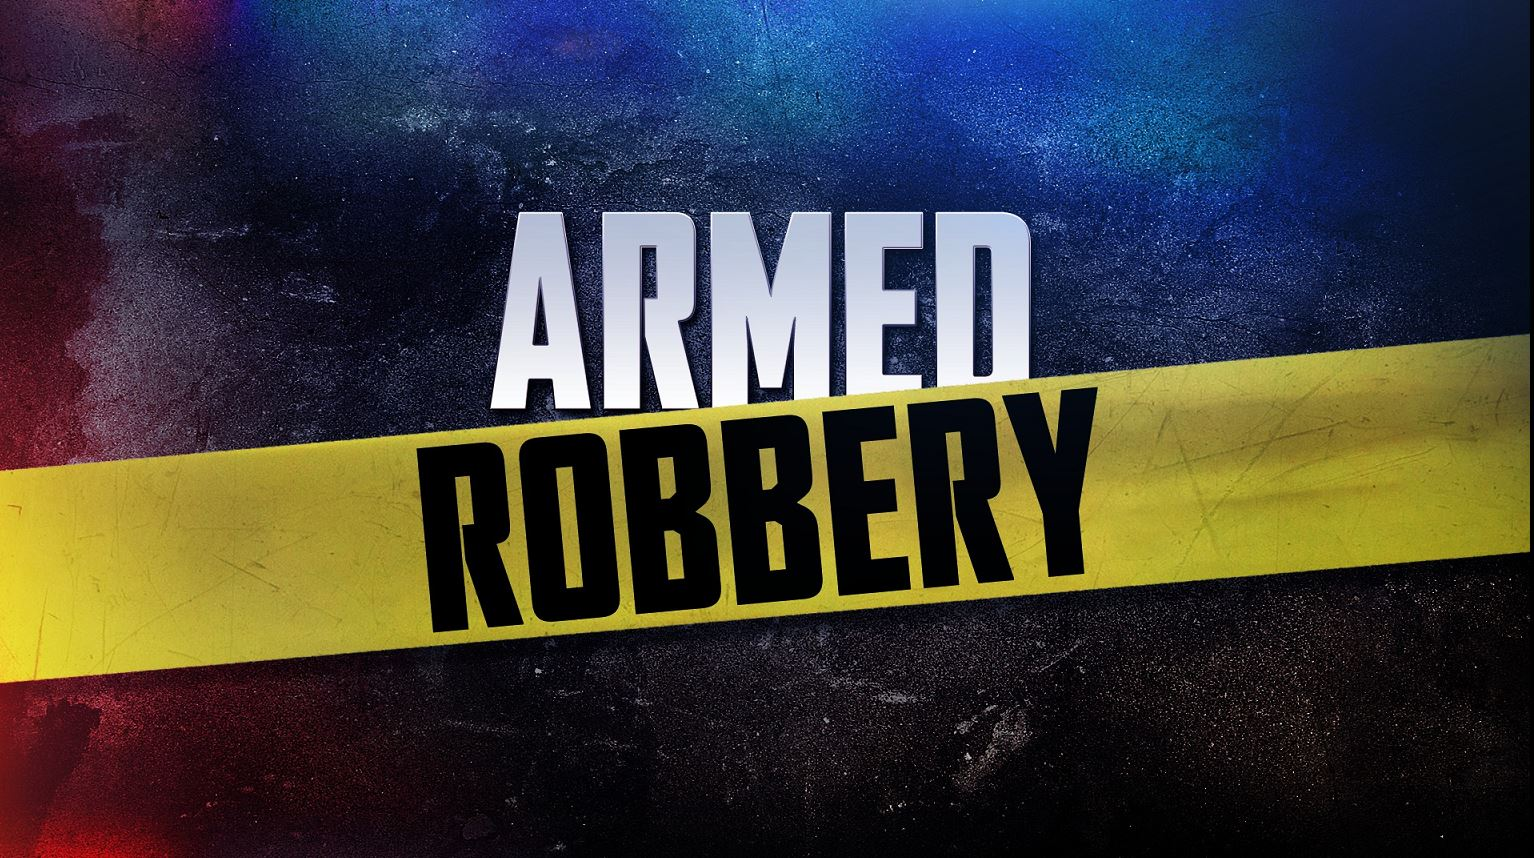 armedrobbery_1547064169975.JPG